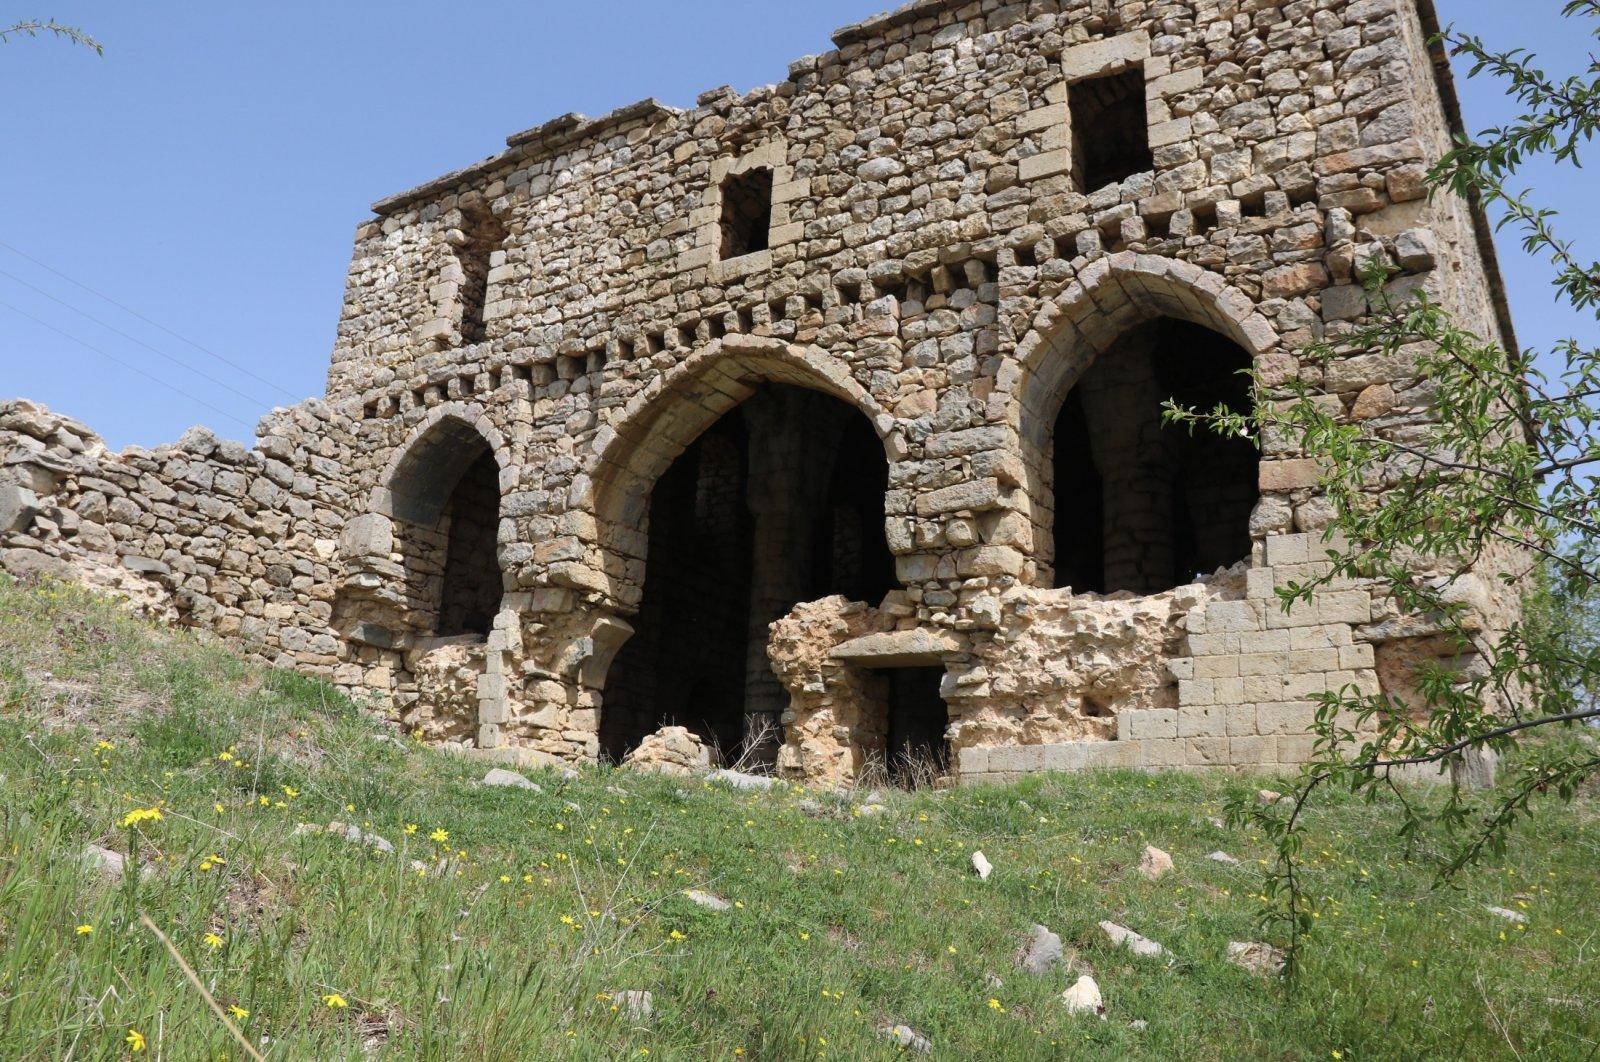 Sun shines upon the ruins of the Virgin Mary Monastery in Çüngüş district of Diyarbakır, Turkey, June 28, 2021. (AA Photo)